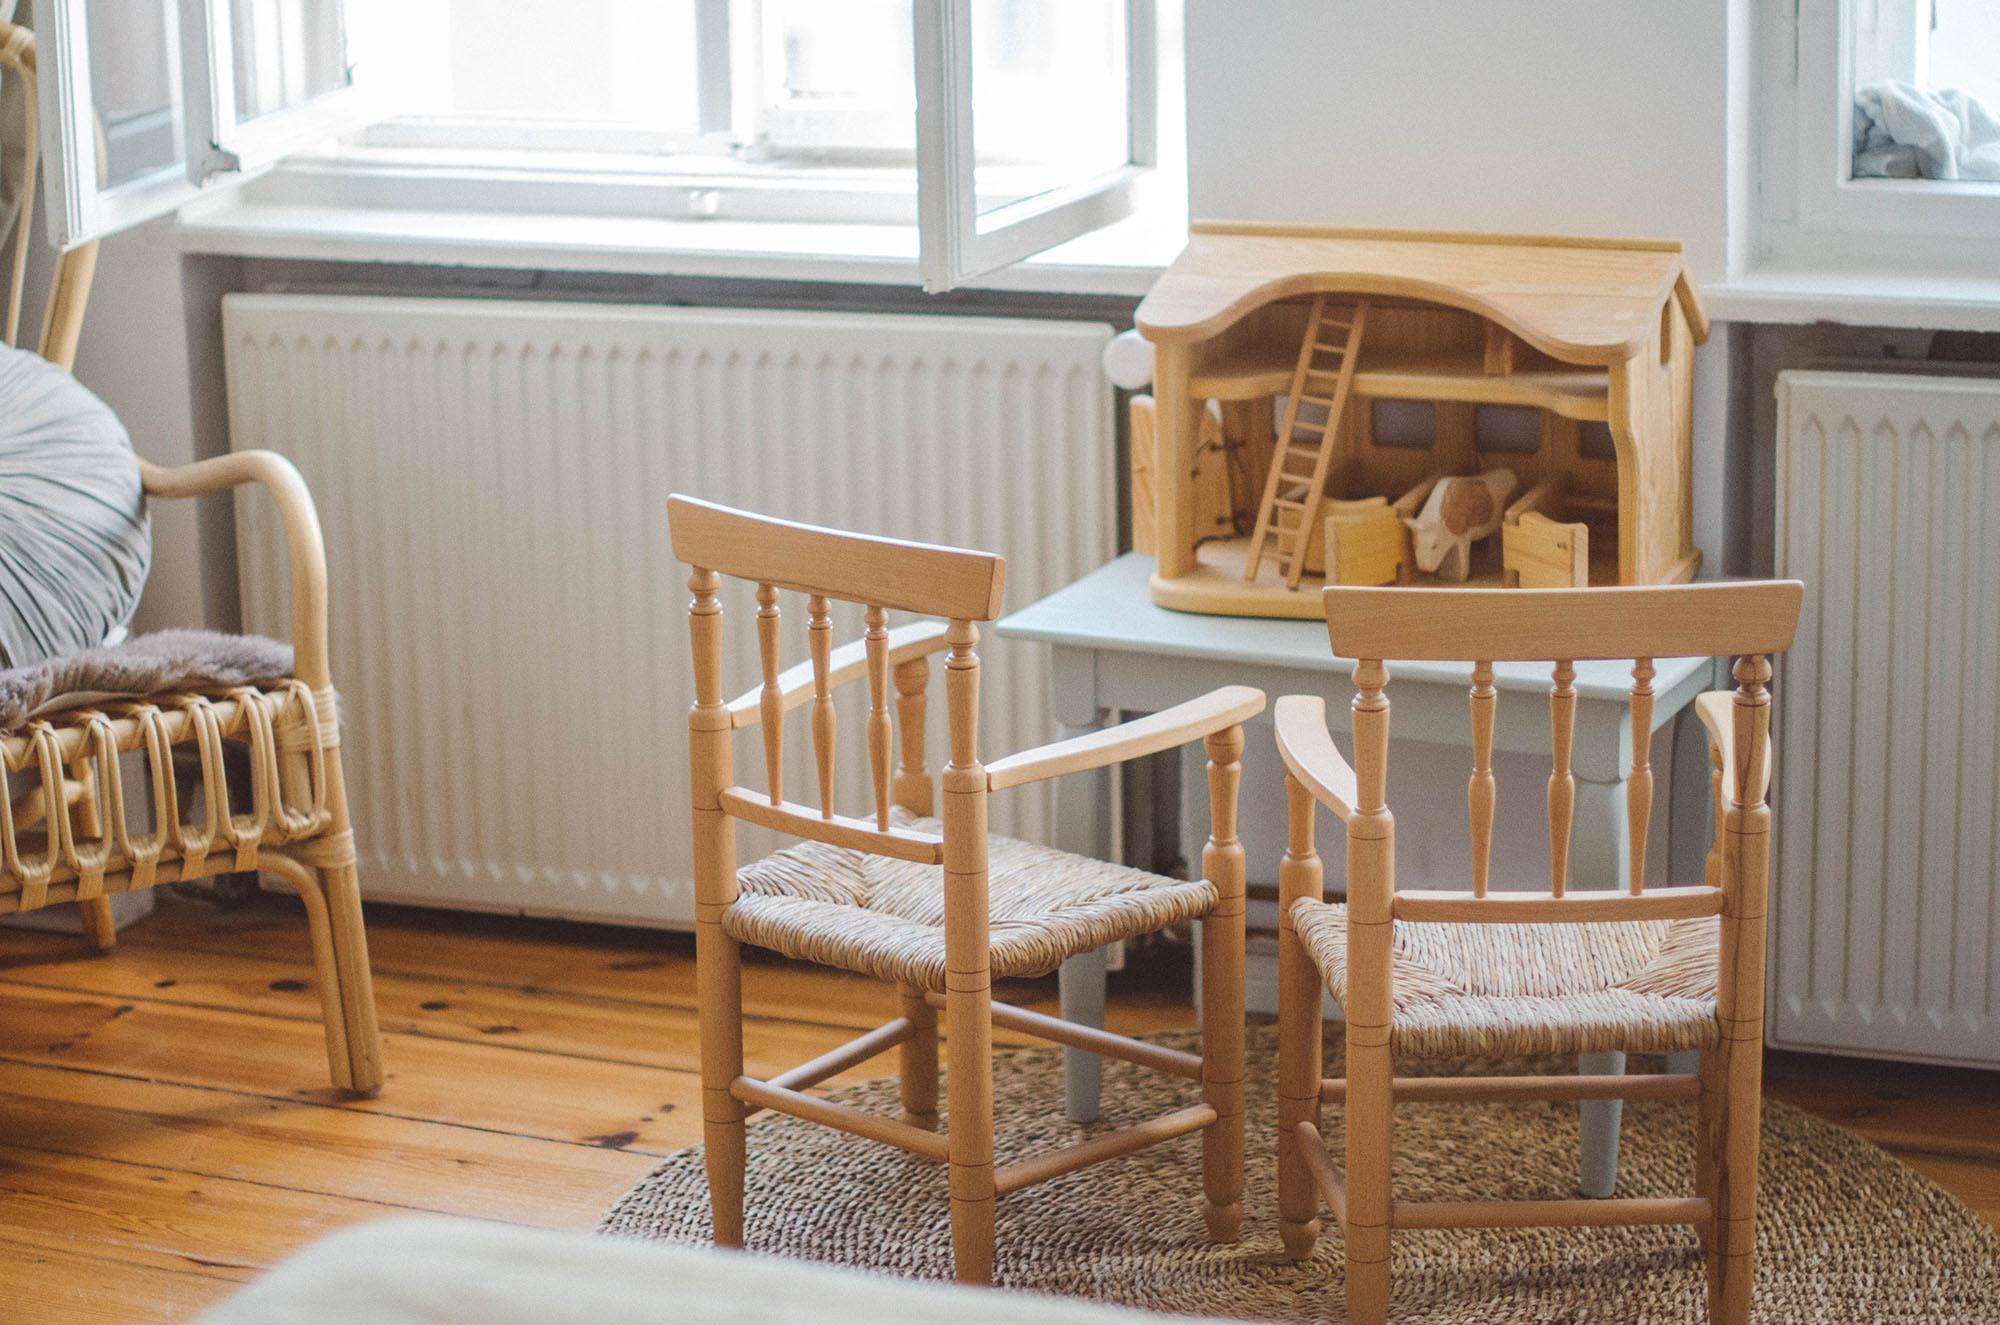 Kinderzimmer Waldorf Holzstall, Ostheimer, fotoshooting familie Freiburg